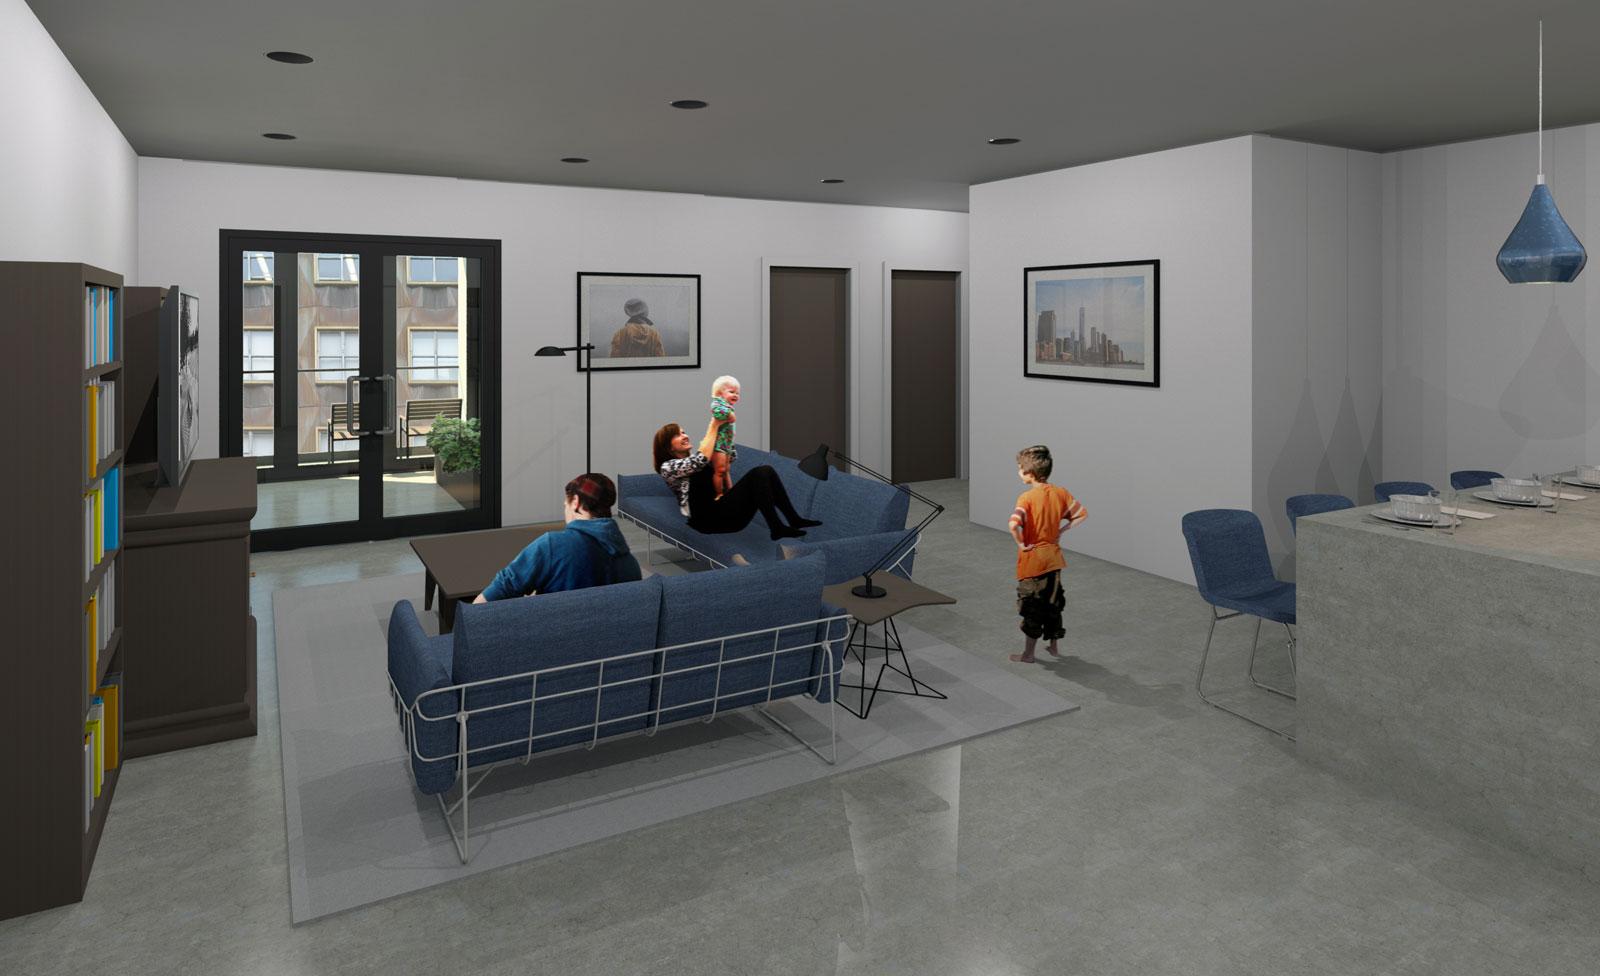 2 Bedroom Interior Post Processed 03